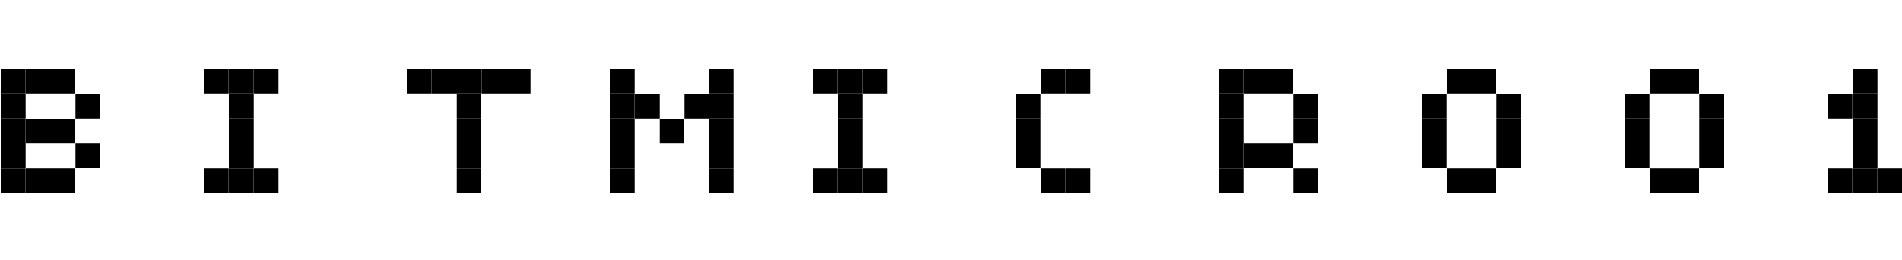 BitMicro01